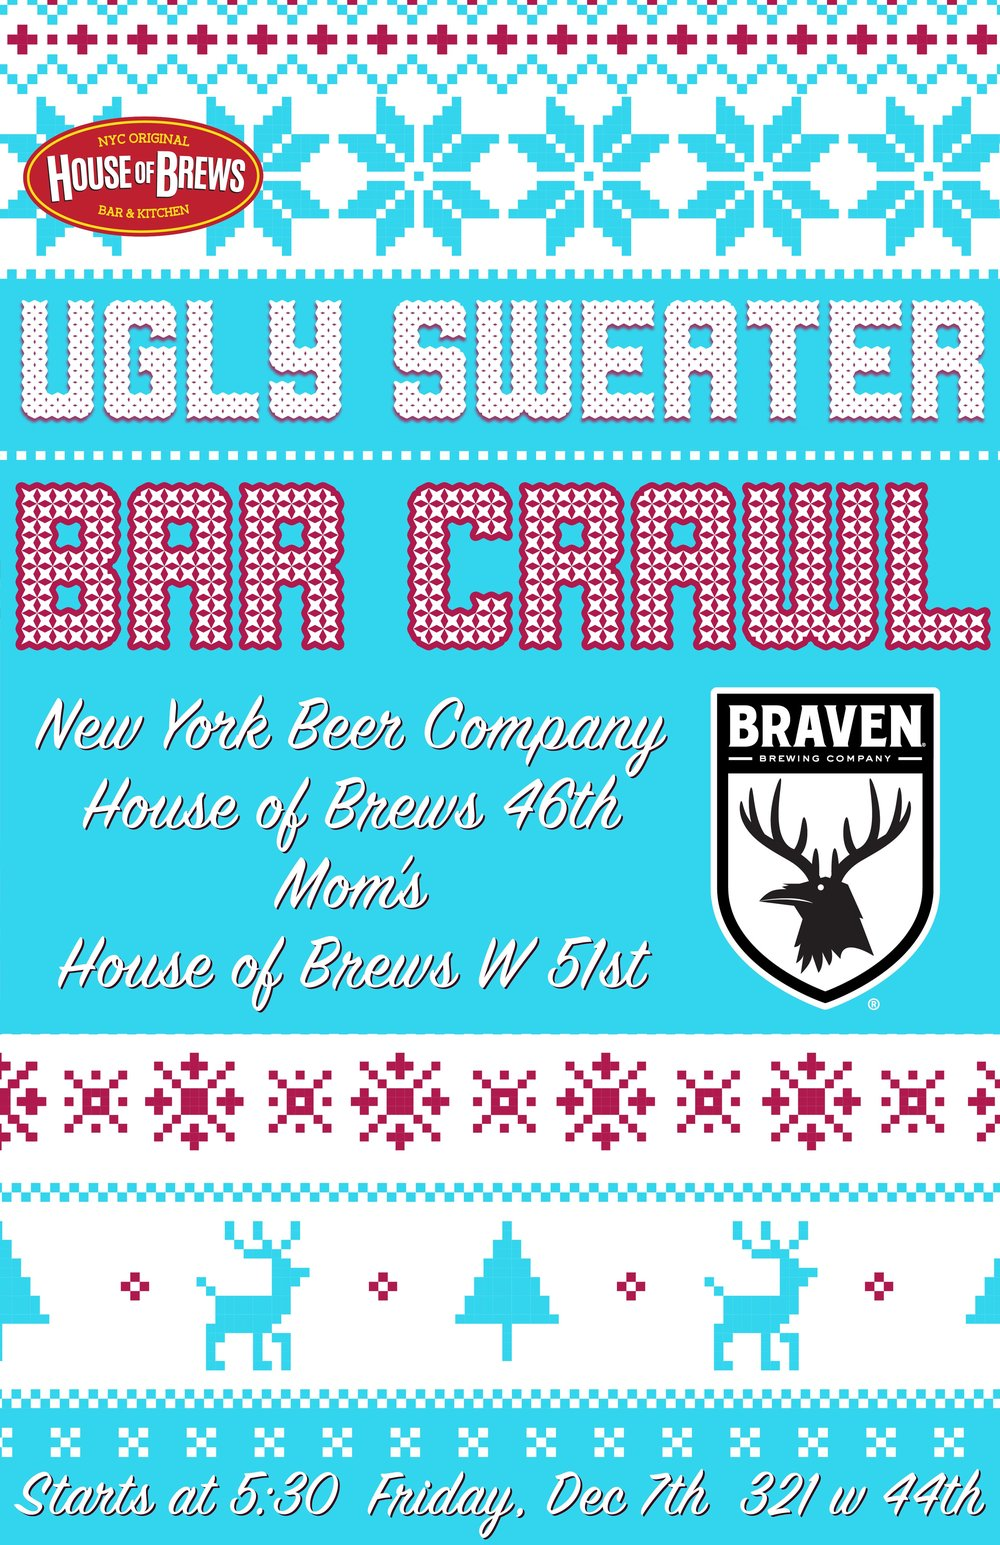 HouseOfBrews_BRAVEN-UGLYSWEATER.jpg